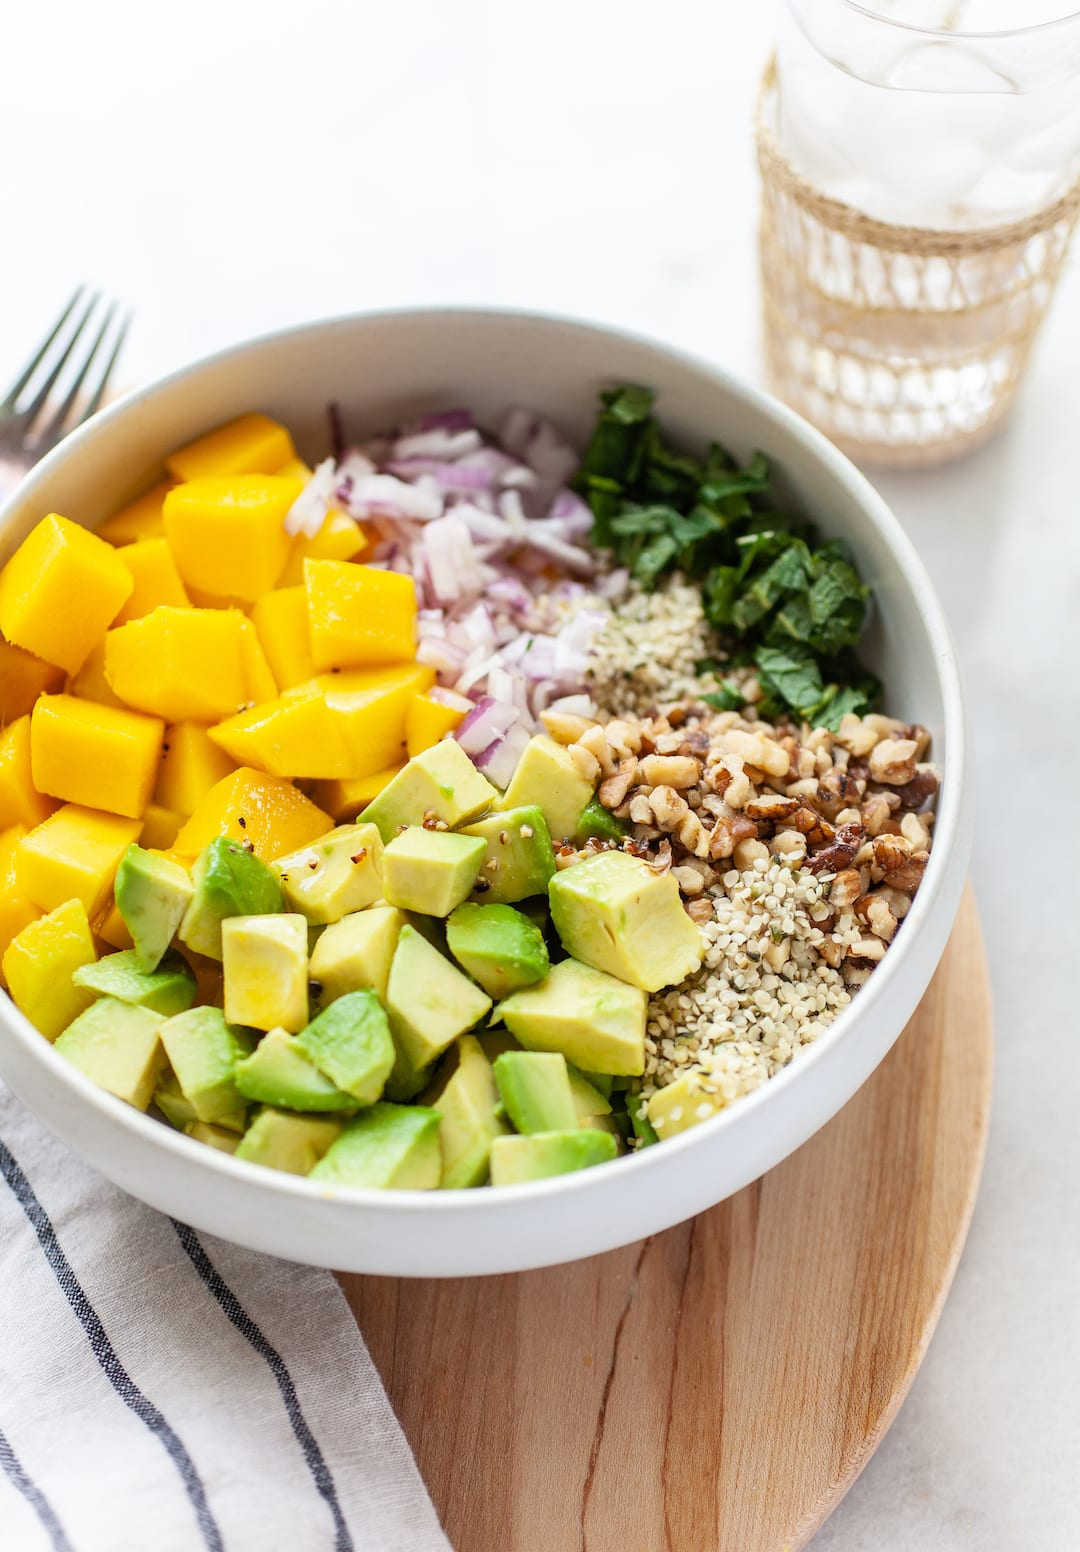 Side view of a mango avocado salad